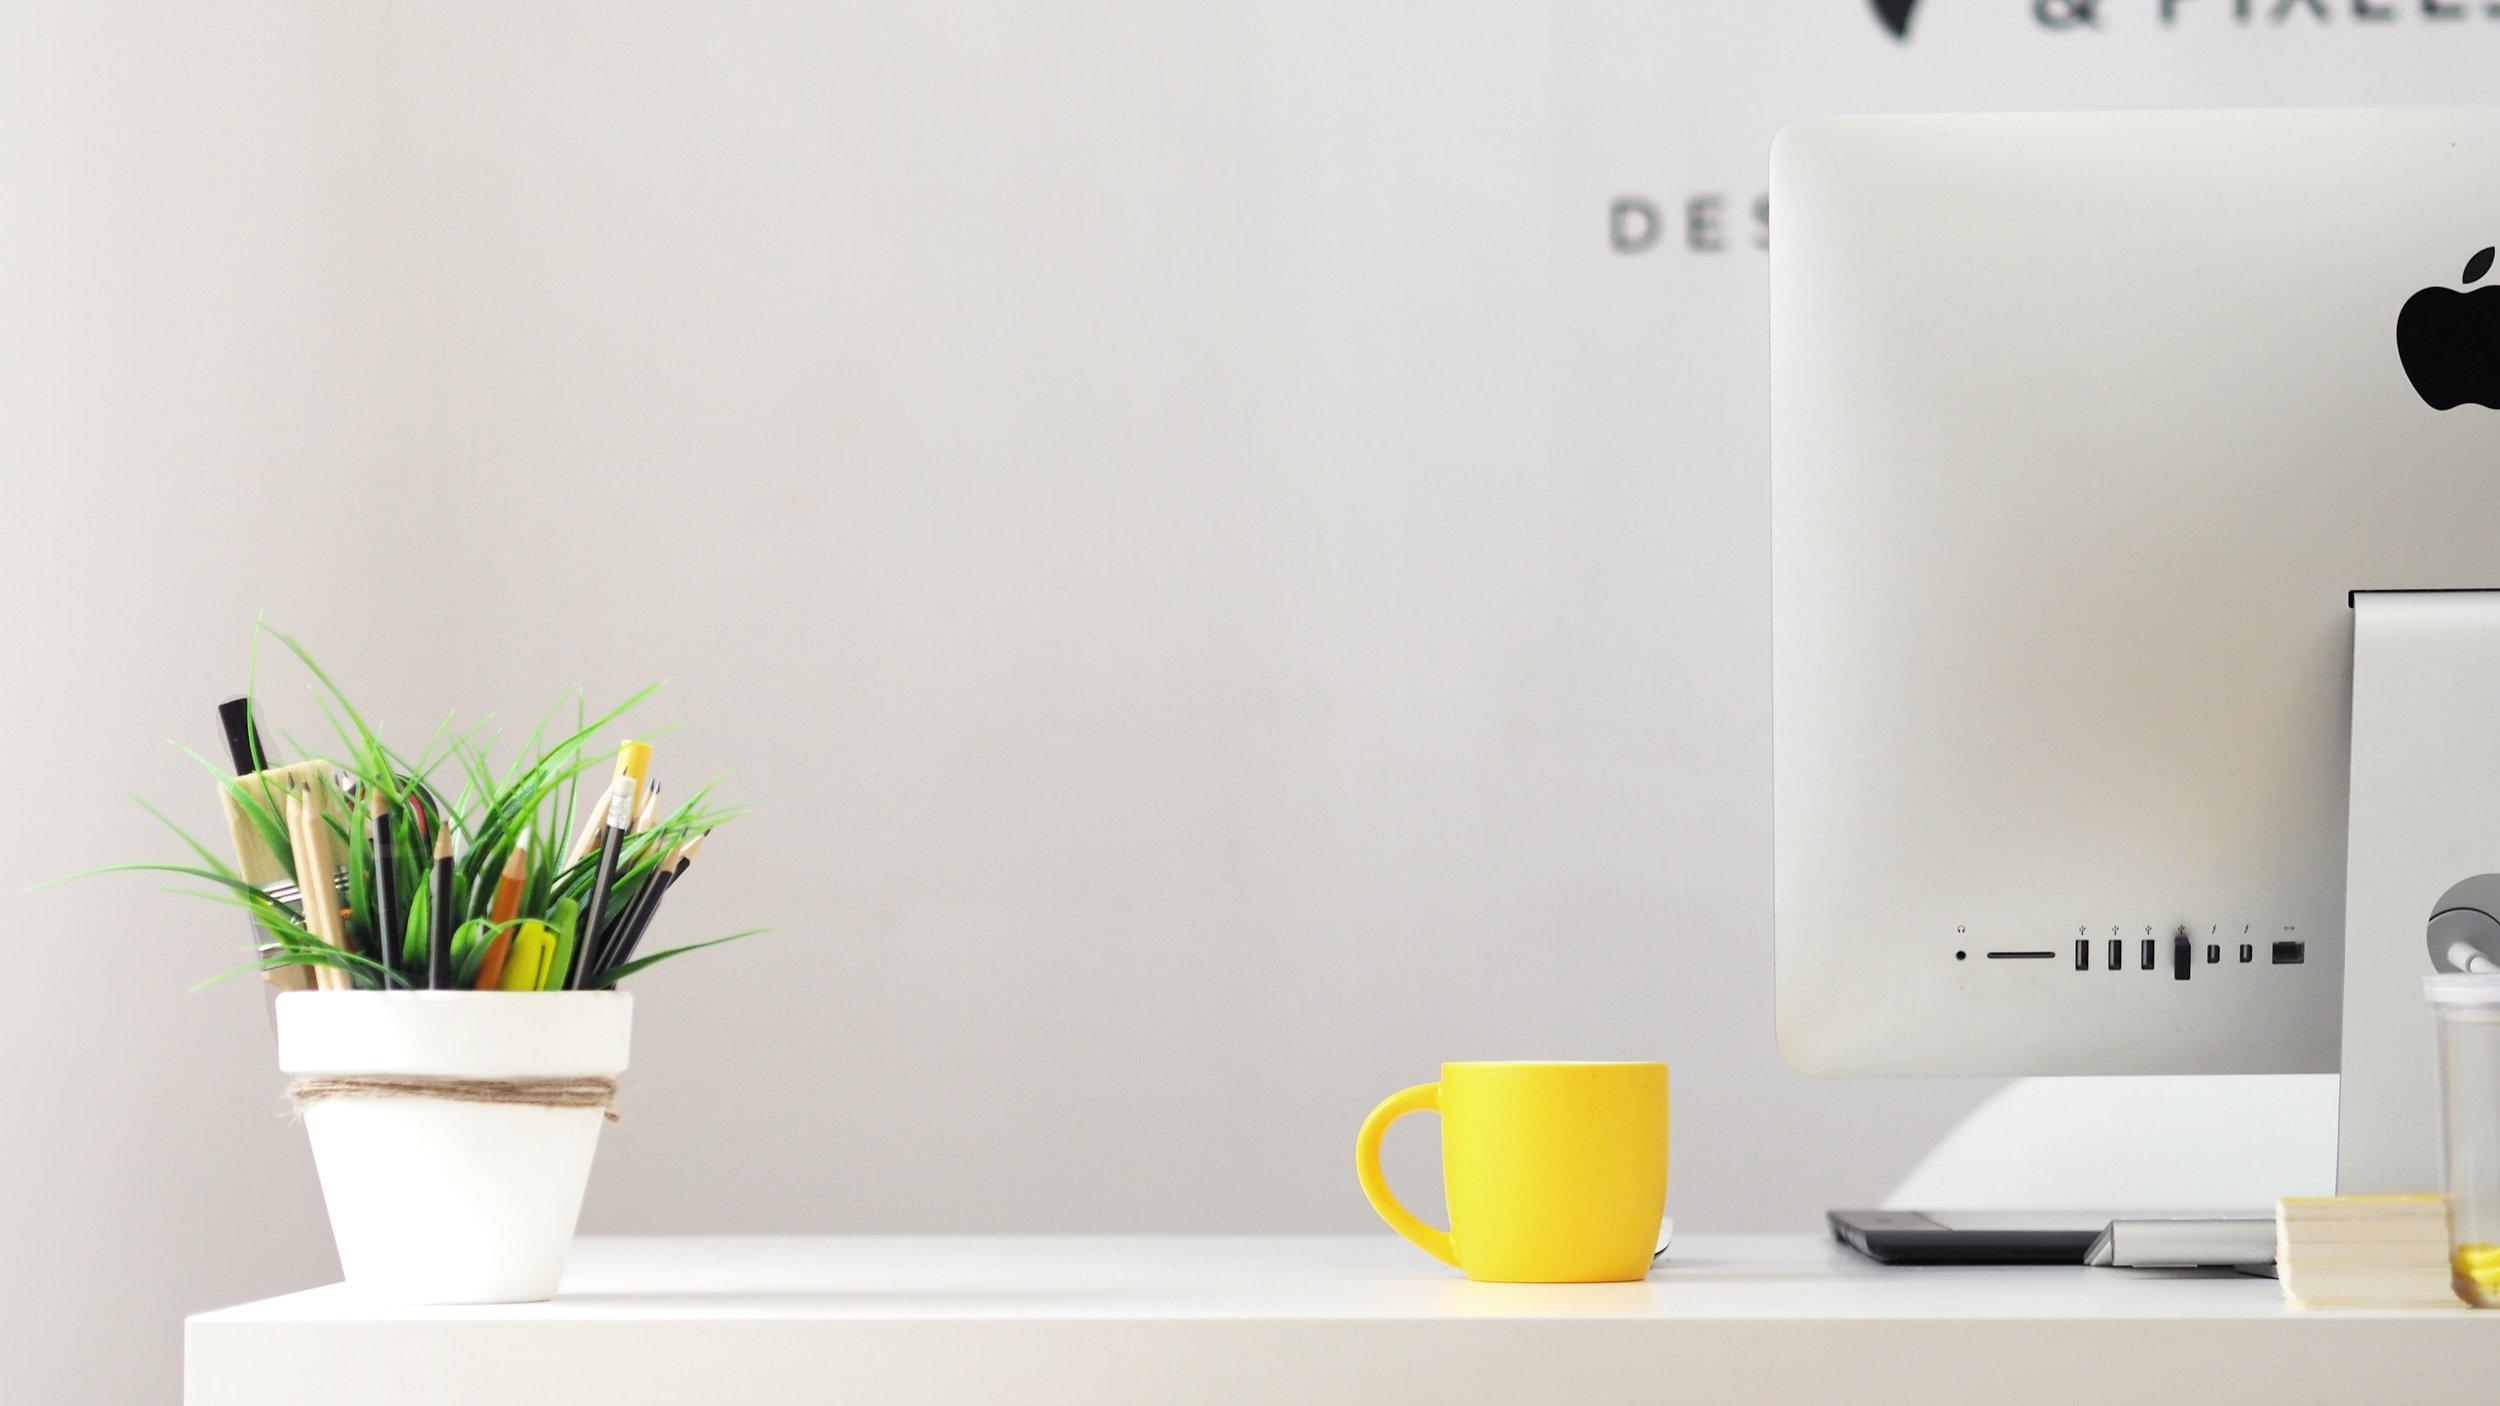 Land your dream job. - Personalized UX portfolio & resume coaching witha Google Designer